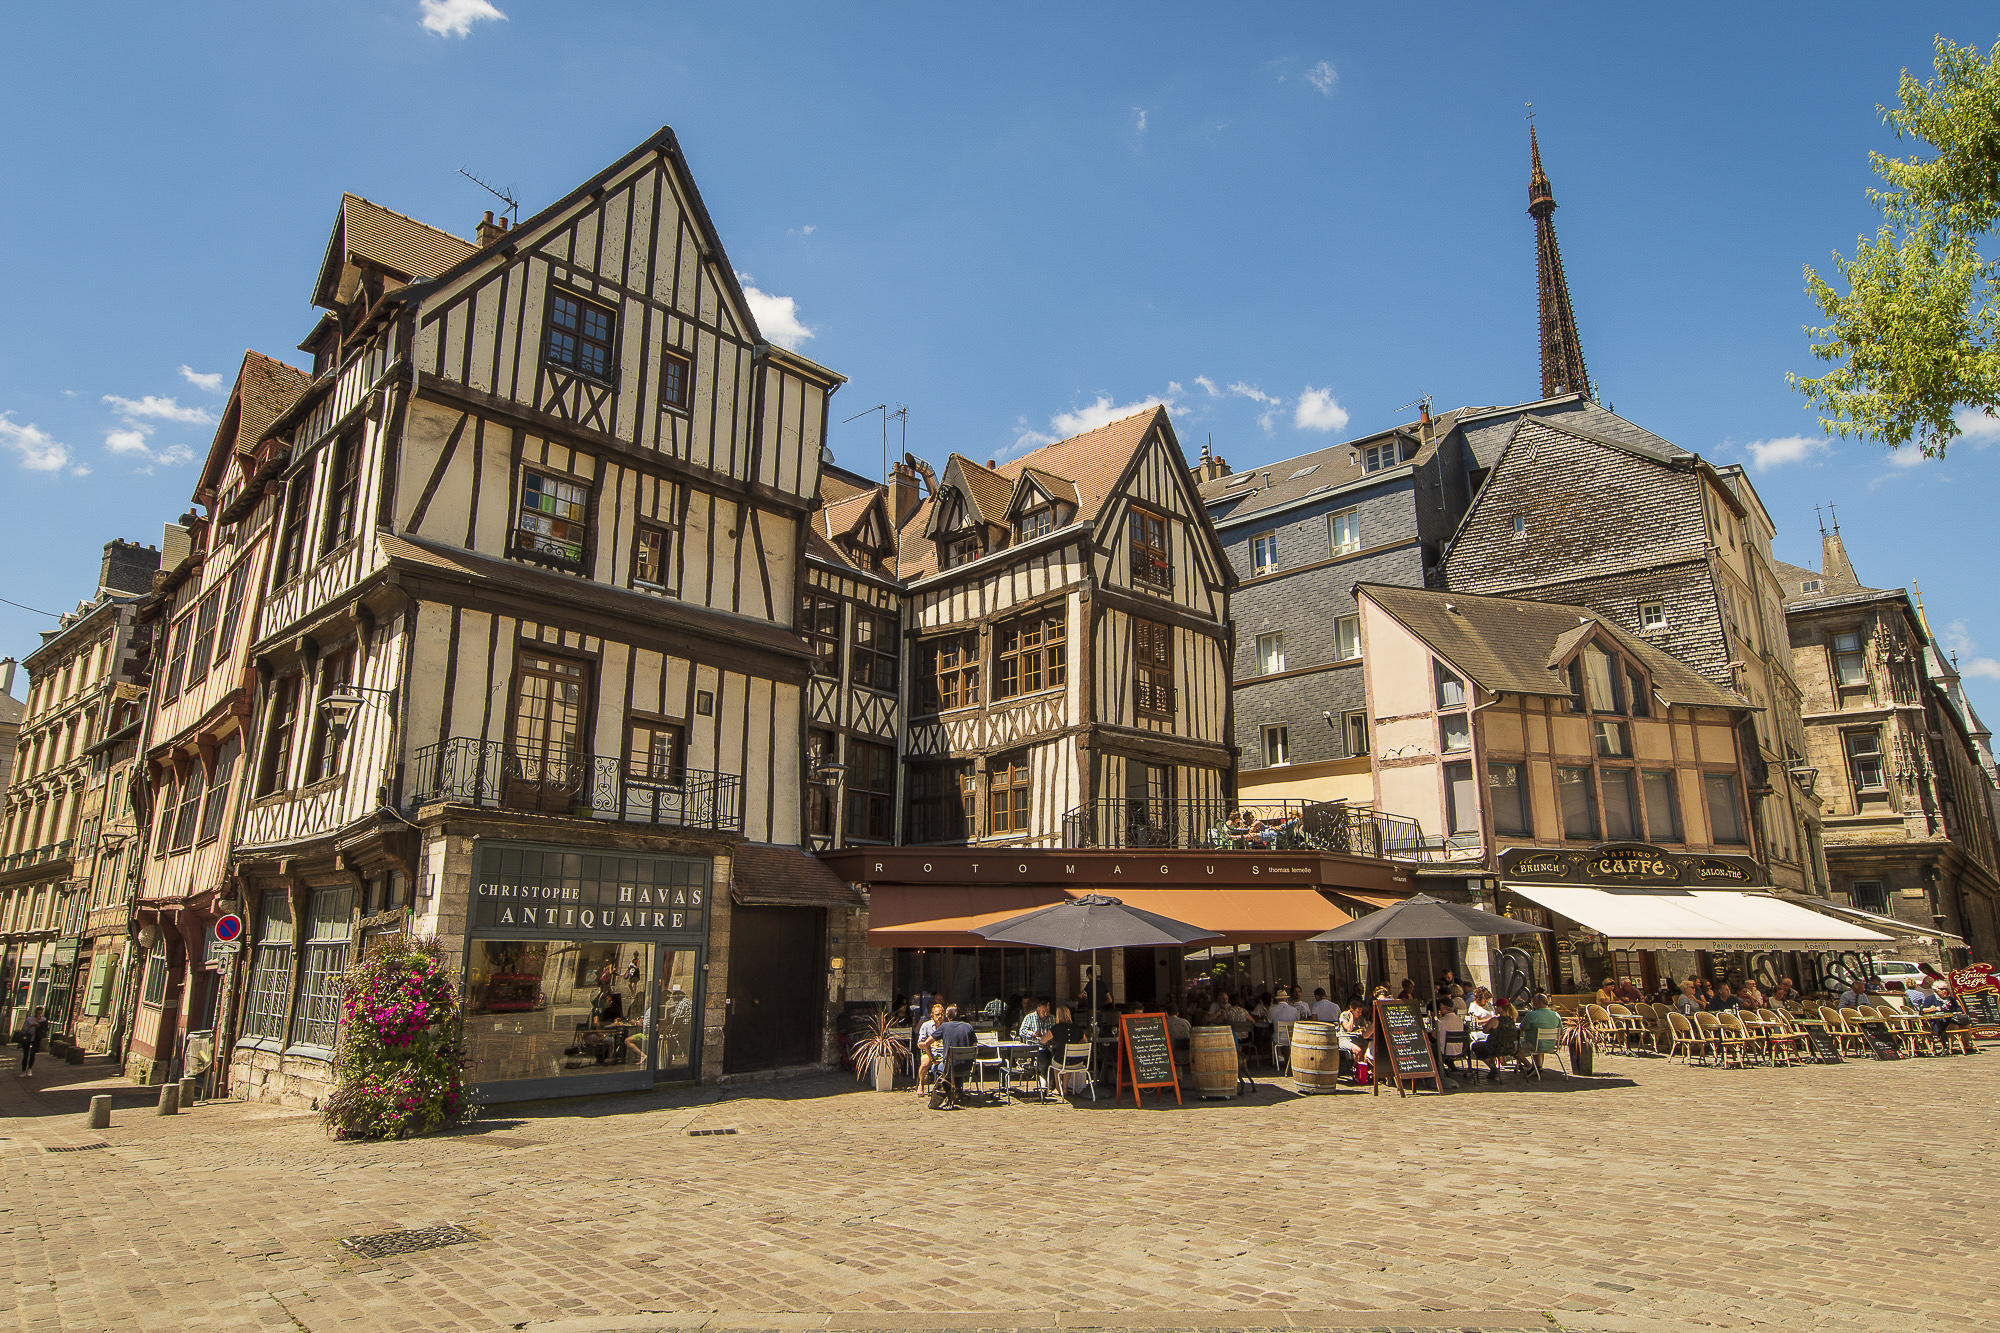 Rouen-002-aperture-tours.jpg